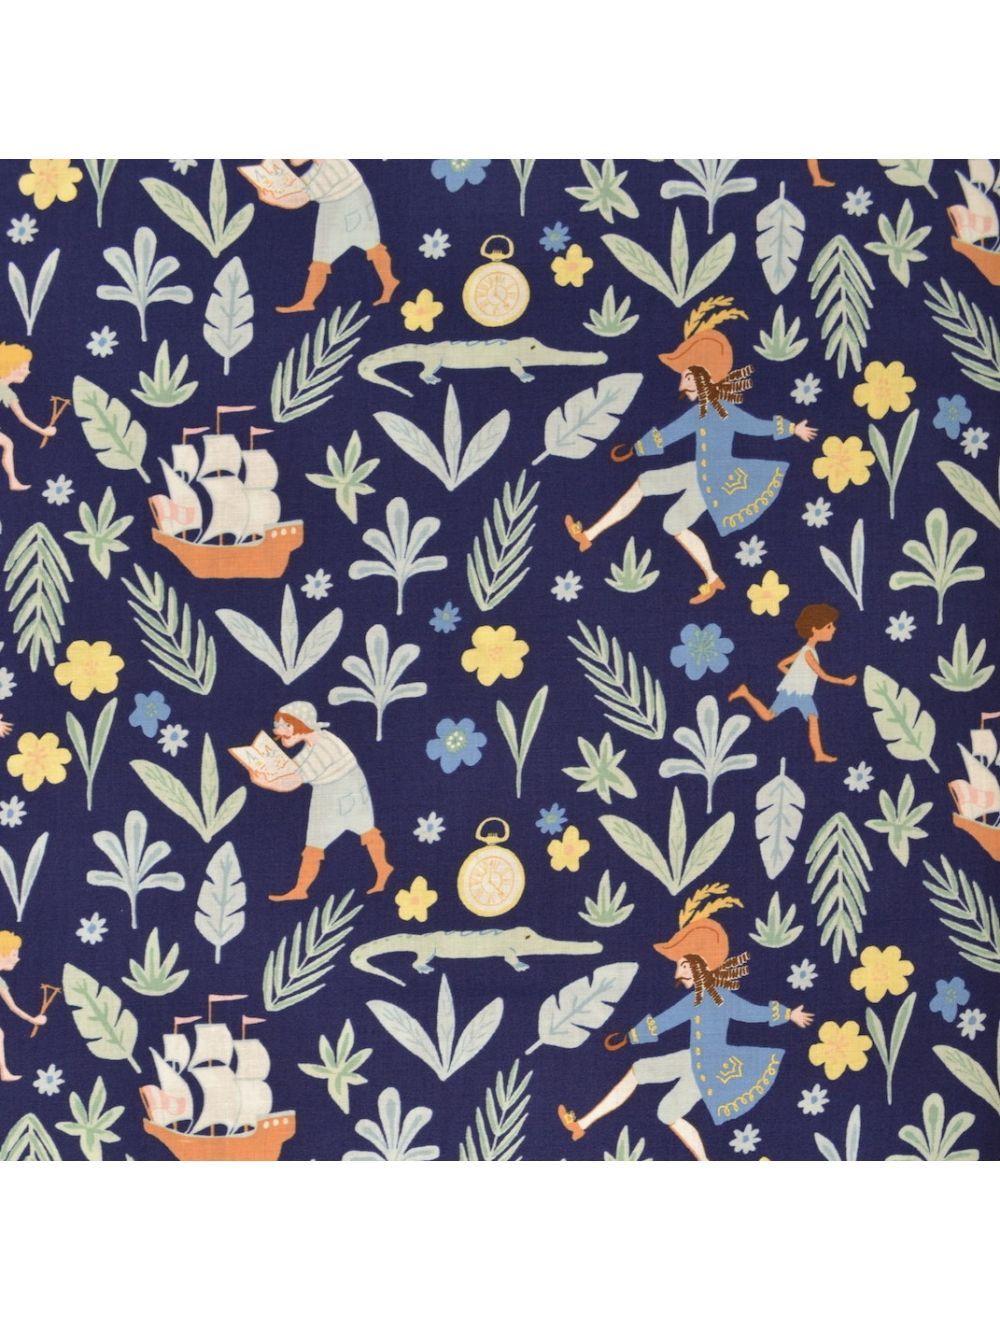 Awfully Big Adventure Nite Michael Miller Fabric Wallpaper